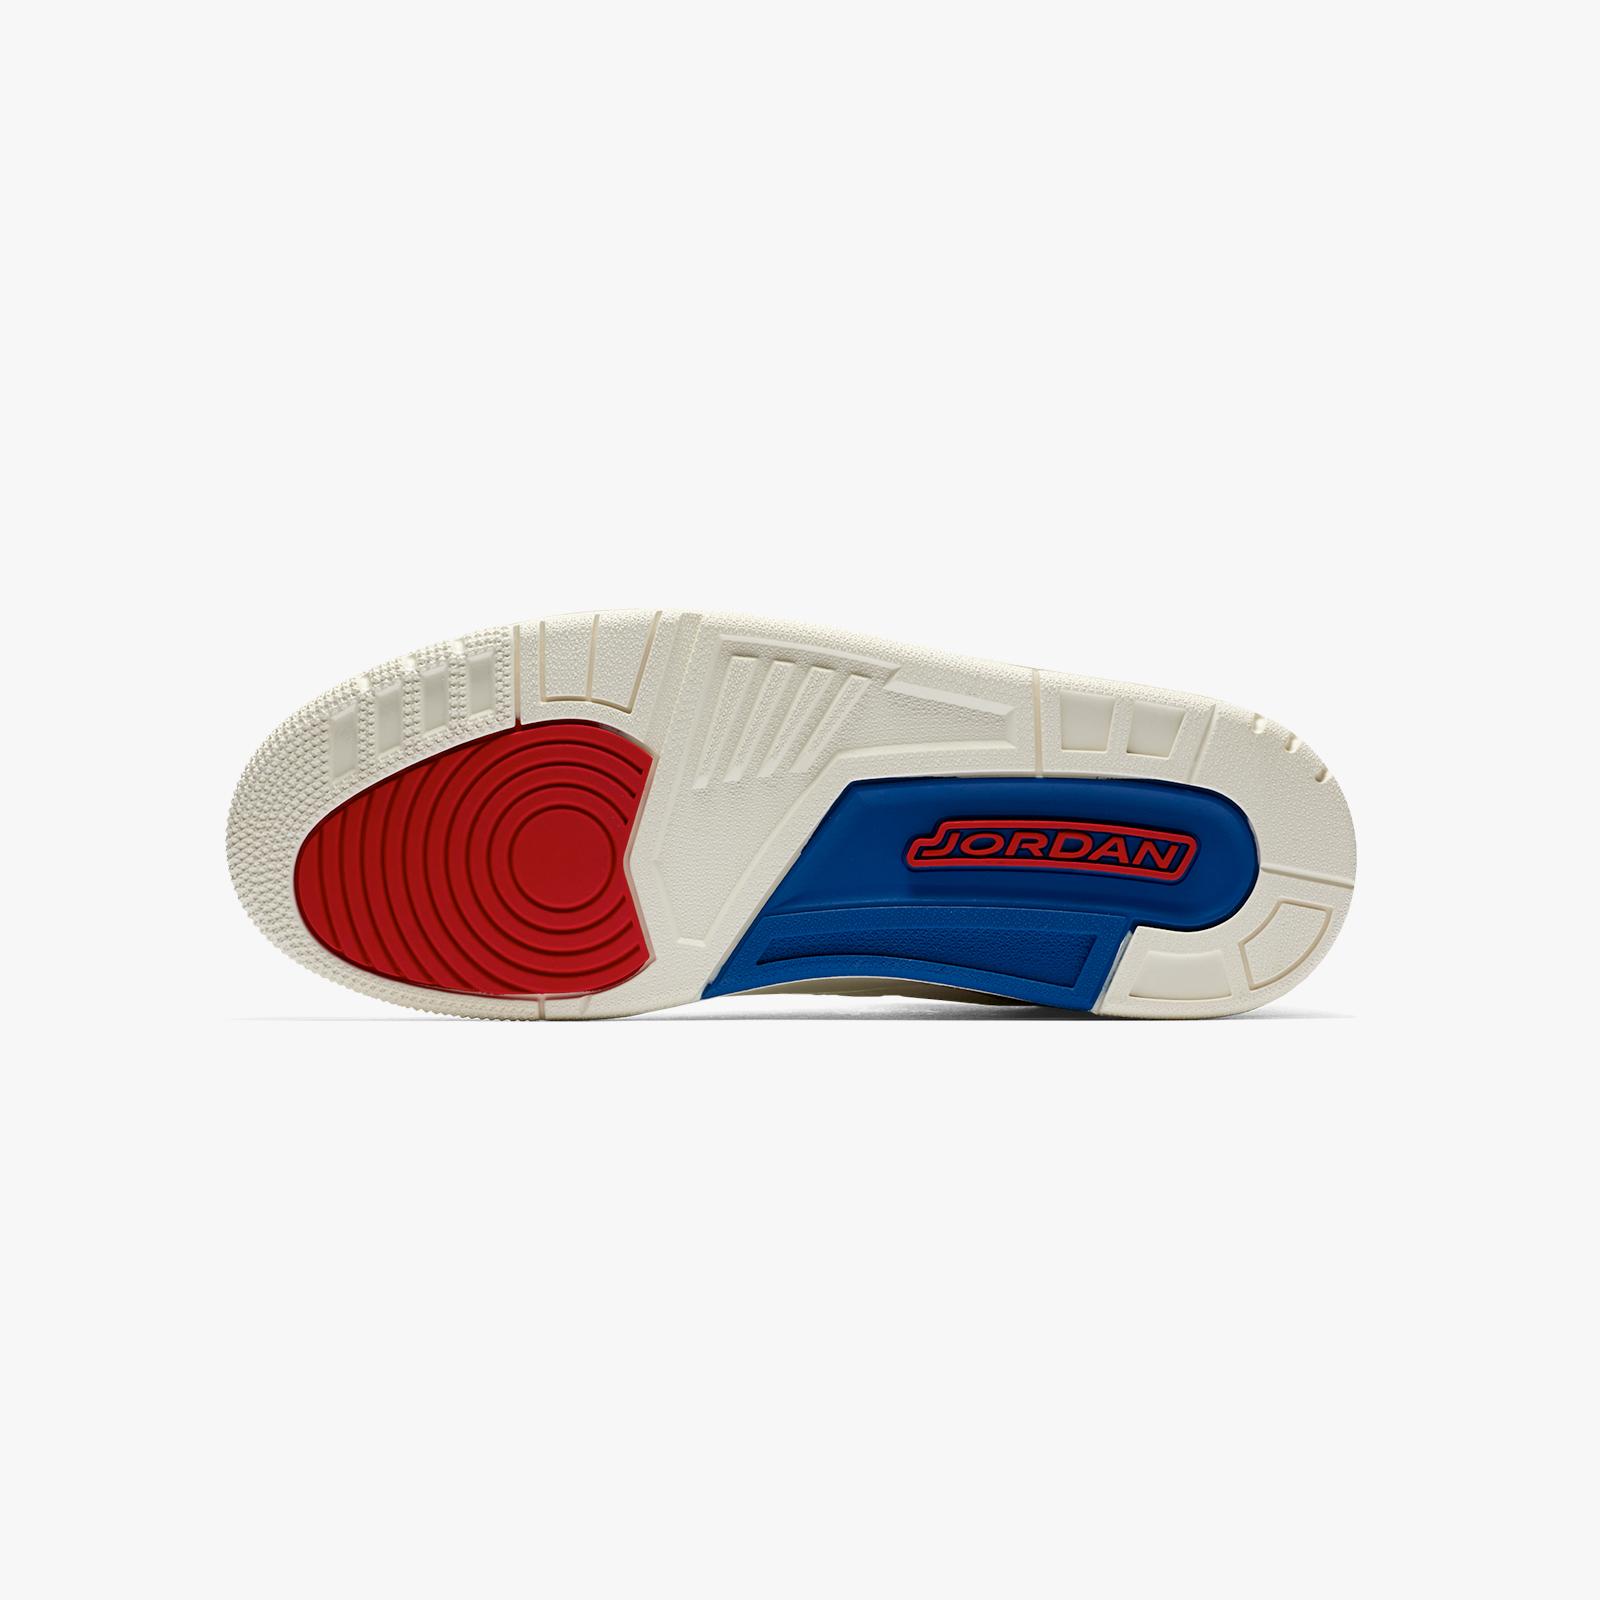 891e904abe2 Jordan Brand Air Jordan 3 Retro - 136064-140 - Sneakersnstuff ...